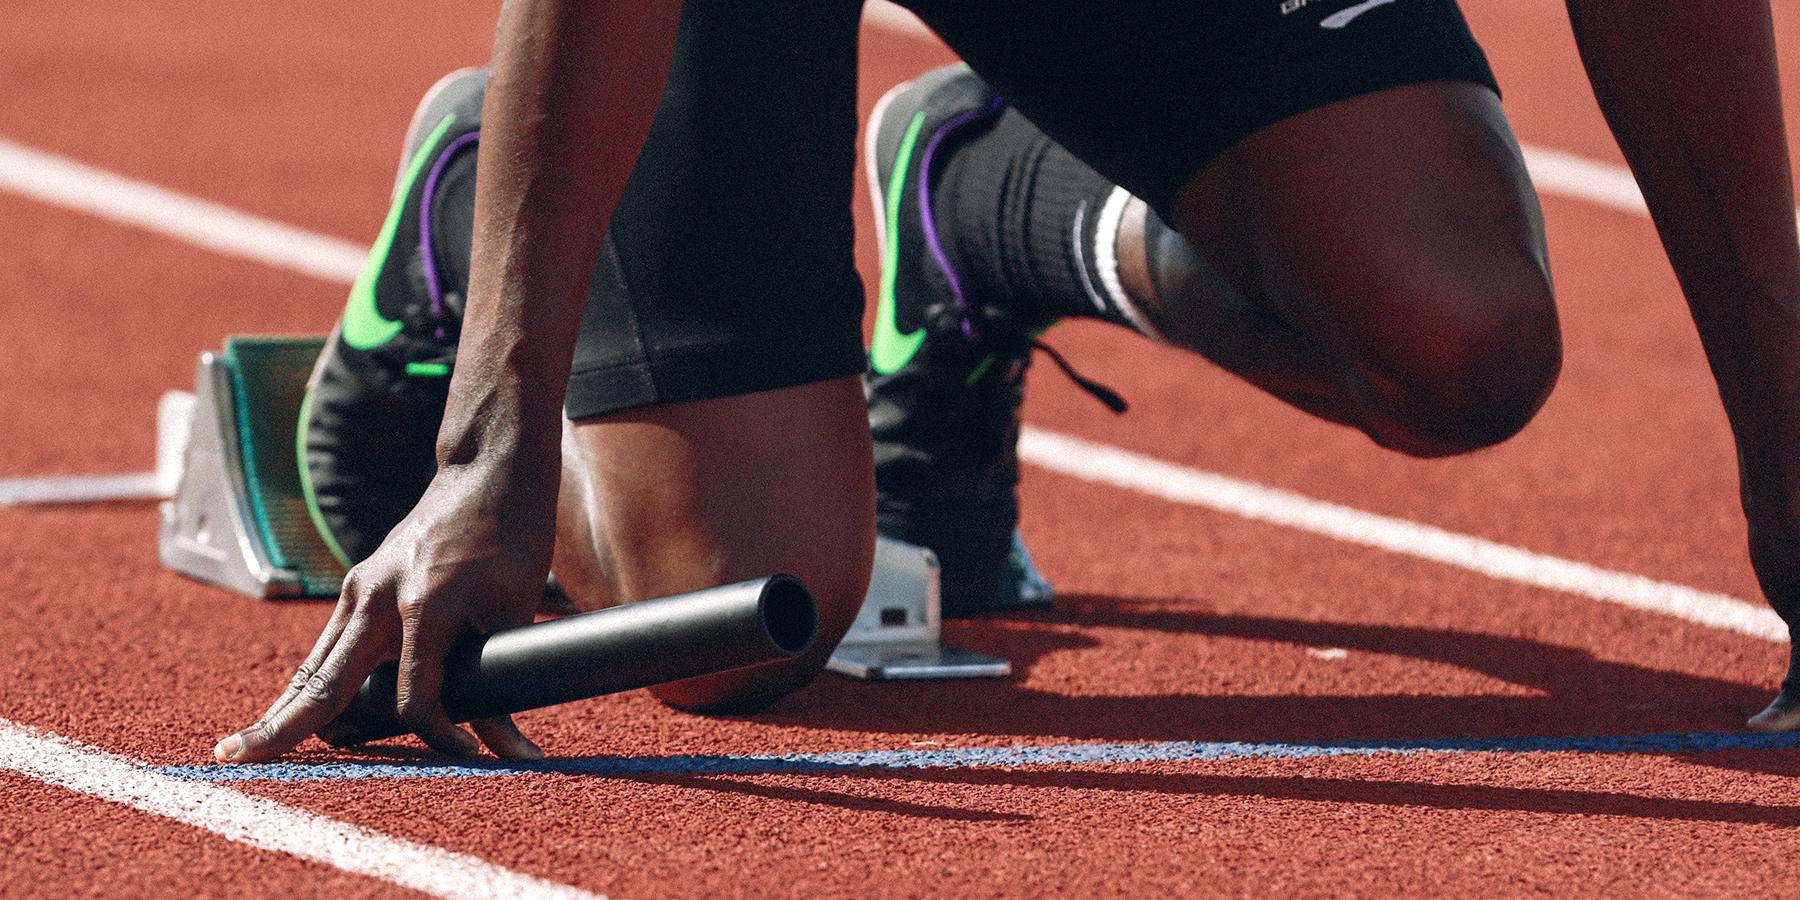 Content Marketing Isn't a Marathon—It's a Relay Race